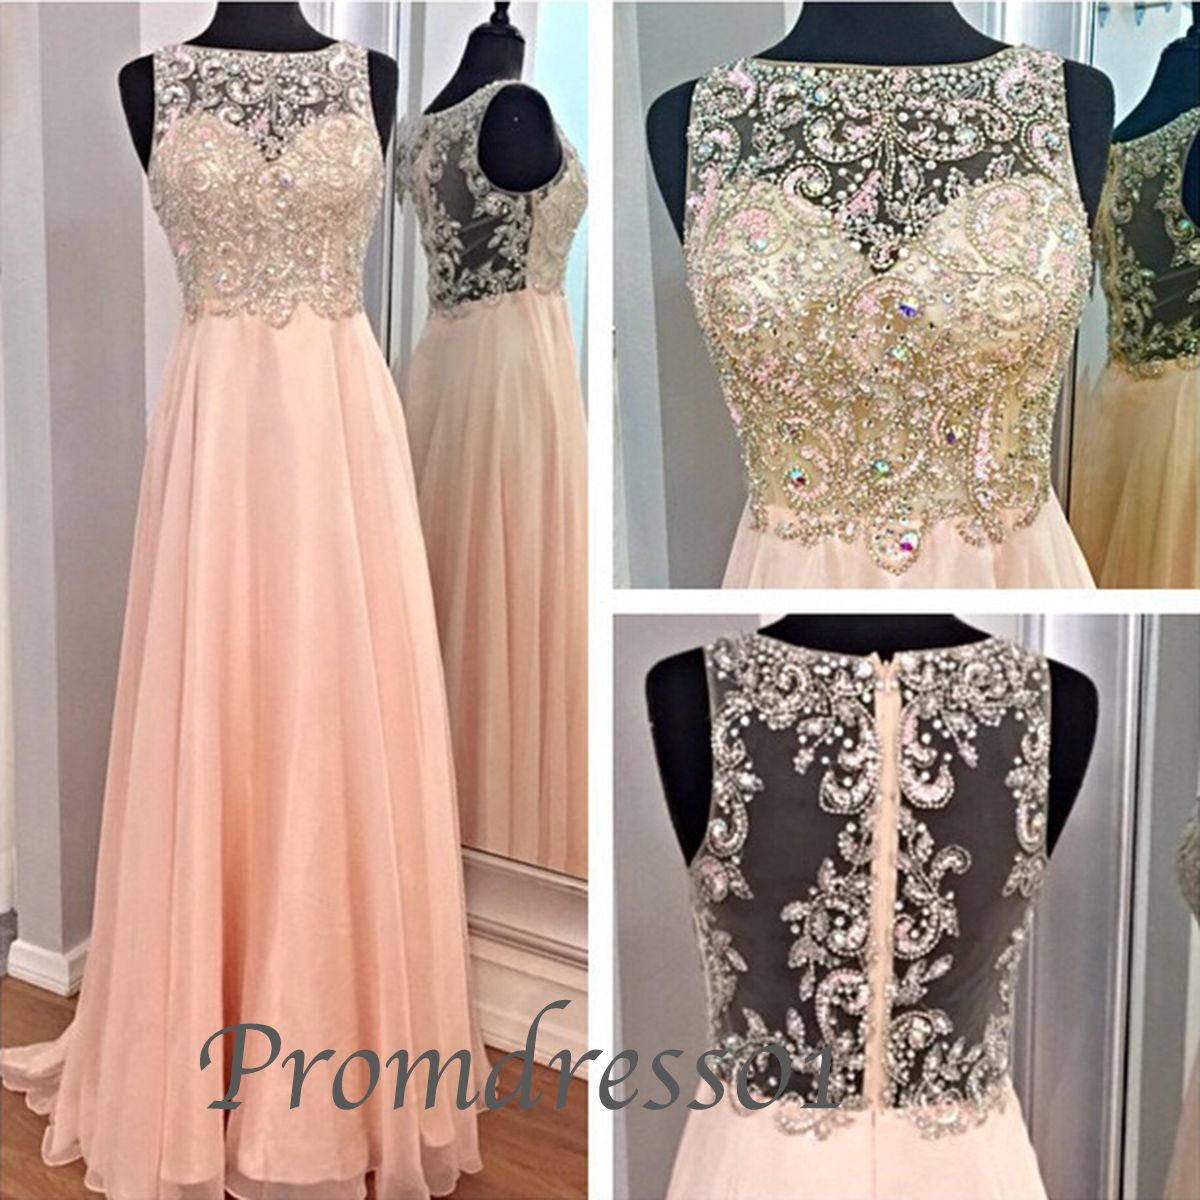 Gorgeous pink chiffon sequins prom dress for teens  promdress  prom  dress a2b8c18db